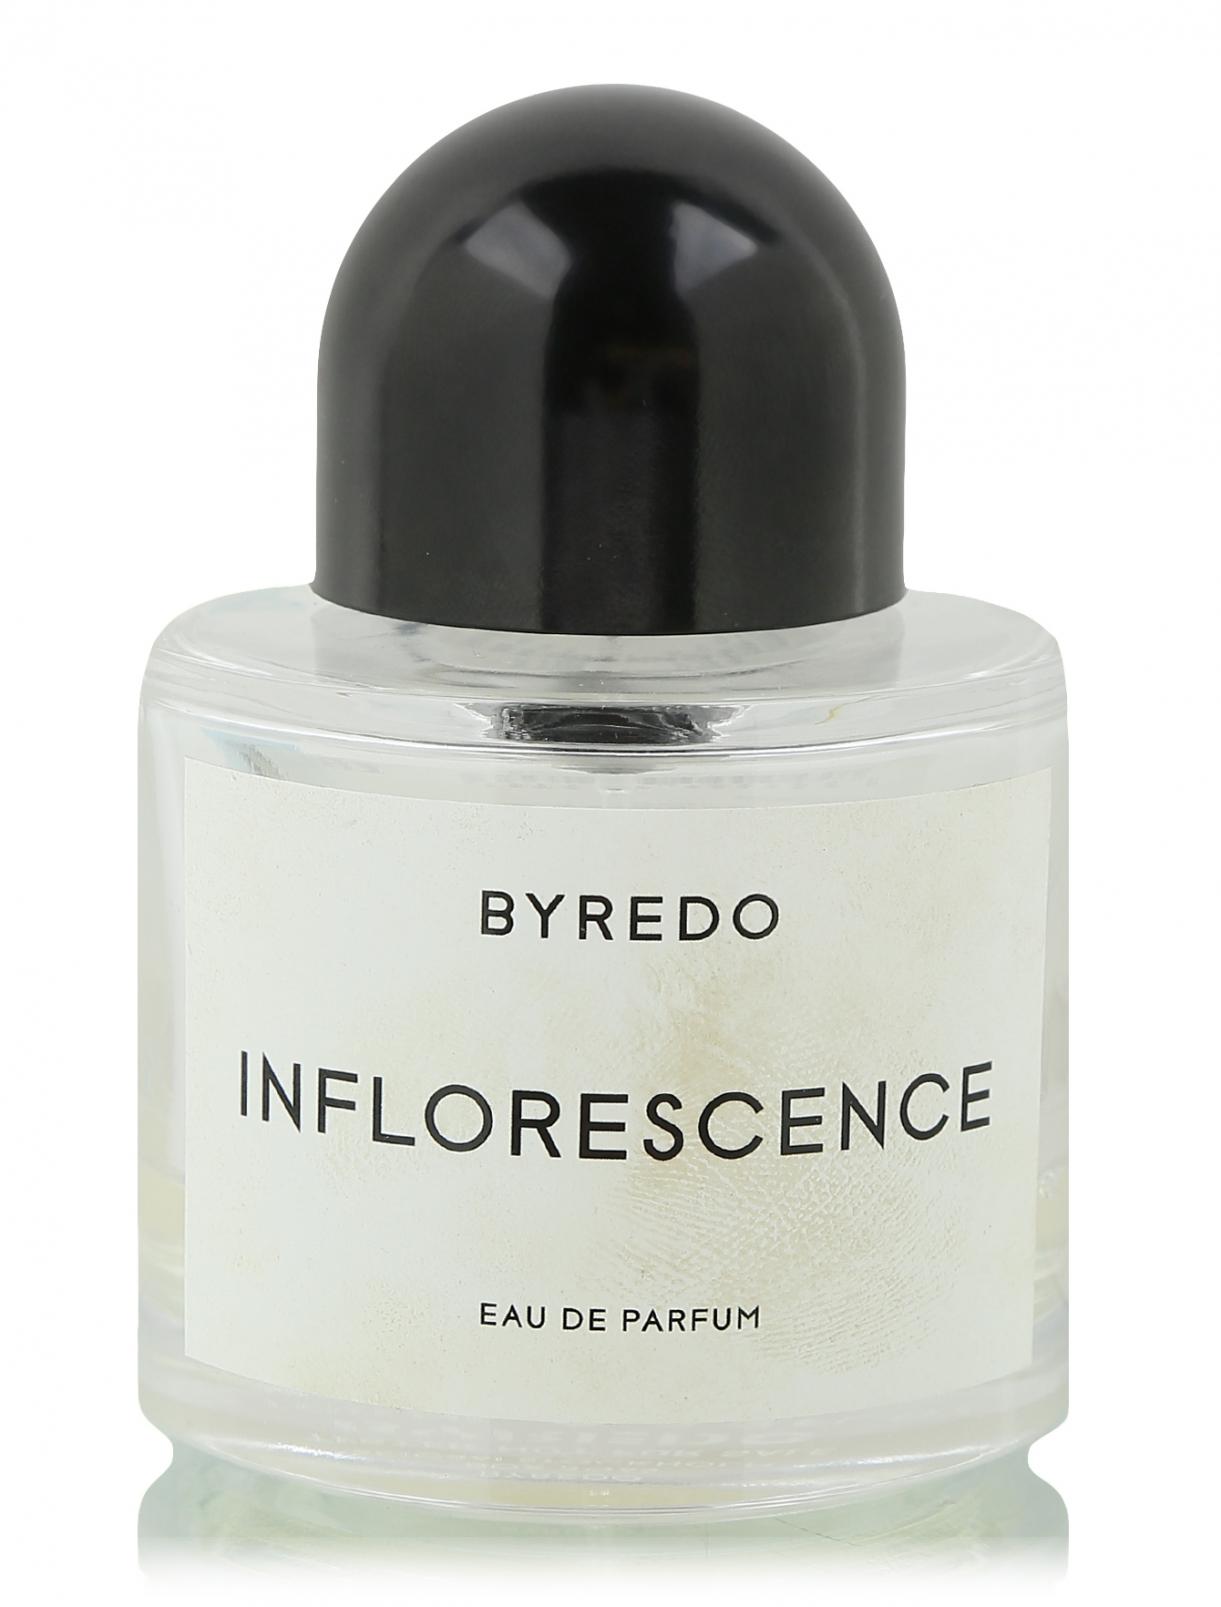 Парфюмерная вода 50 мл Inflorescence Byredo  –  Общий вид